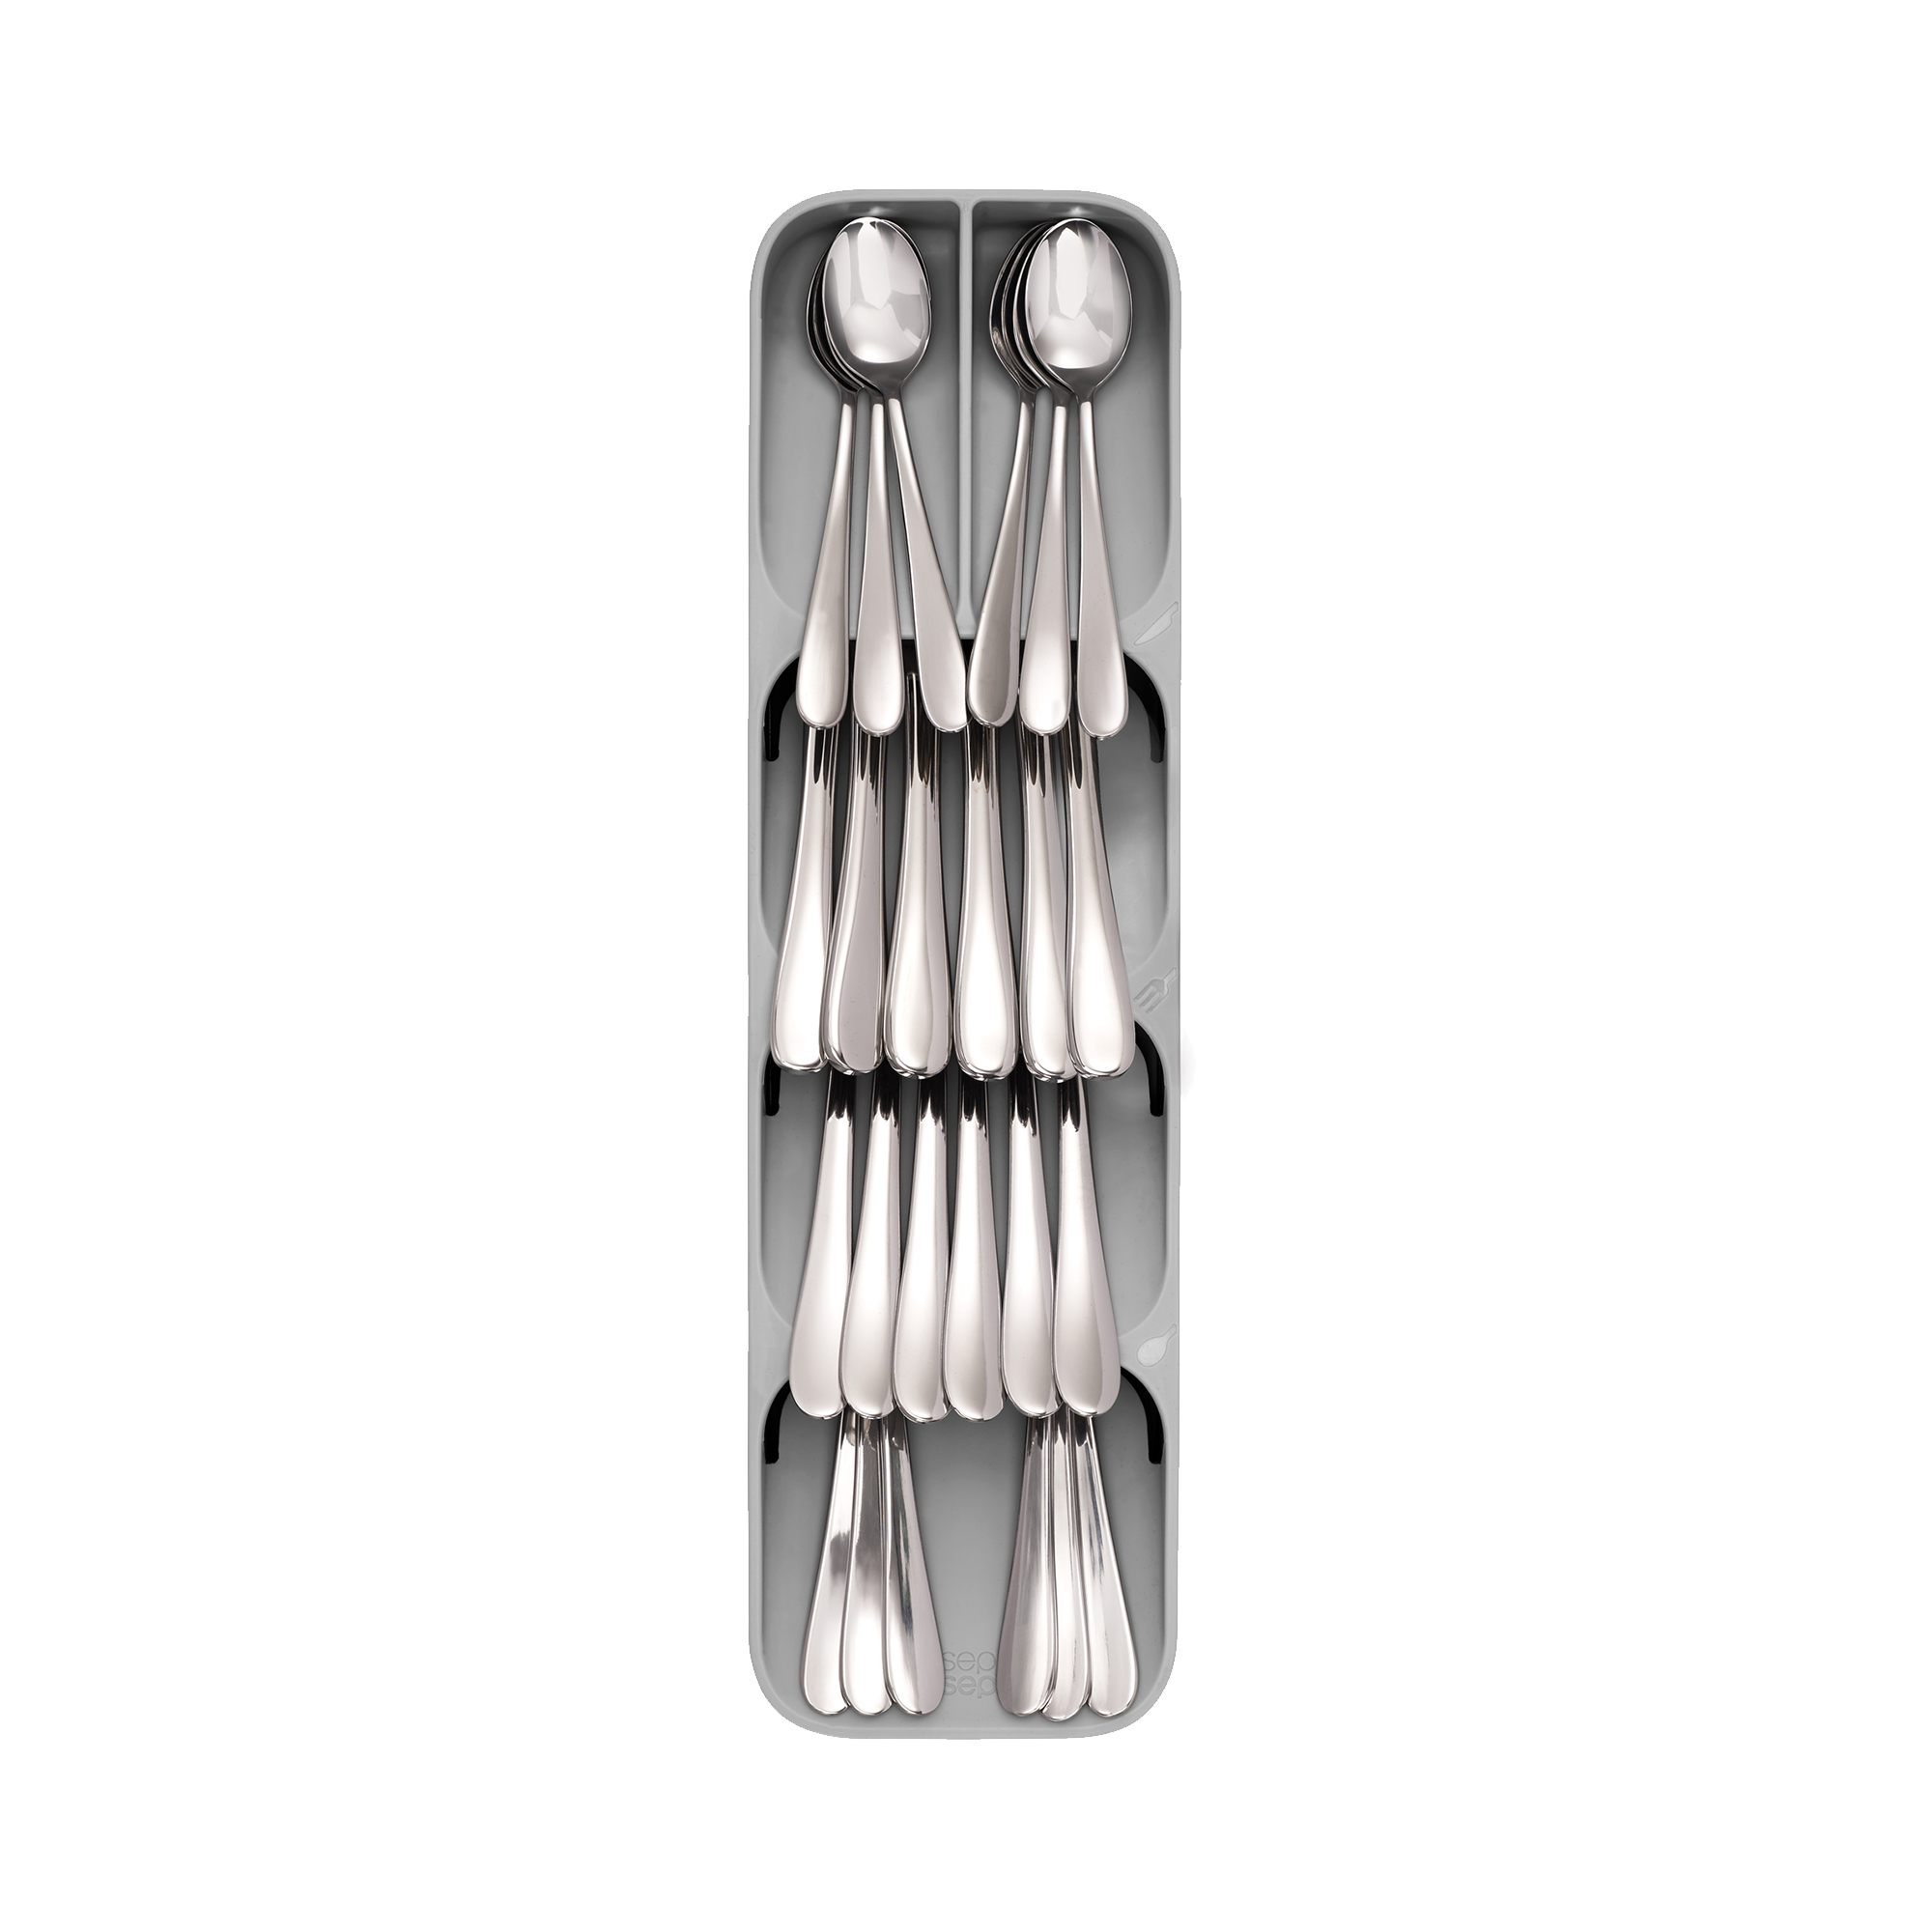 Joseph Joseph - Cutlery Design